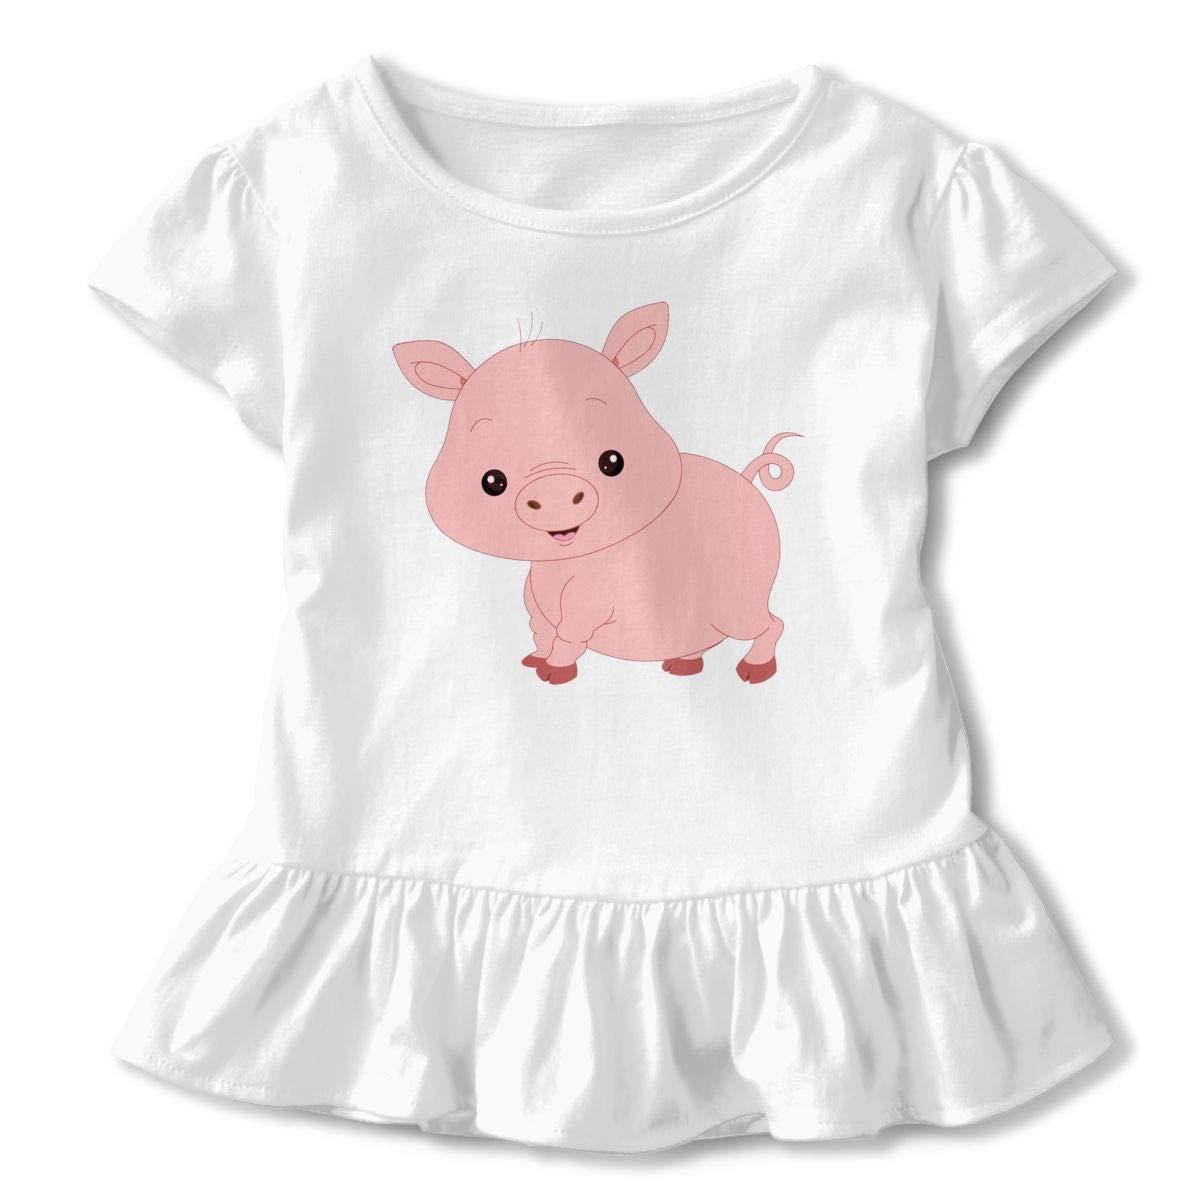 2-Pack Cotton Tee Pink Pig Faces Baby Girls Short Sleeve Ruffles T-Shirt Tops